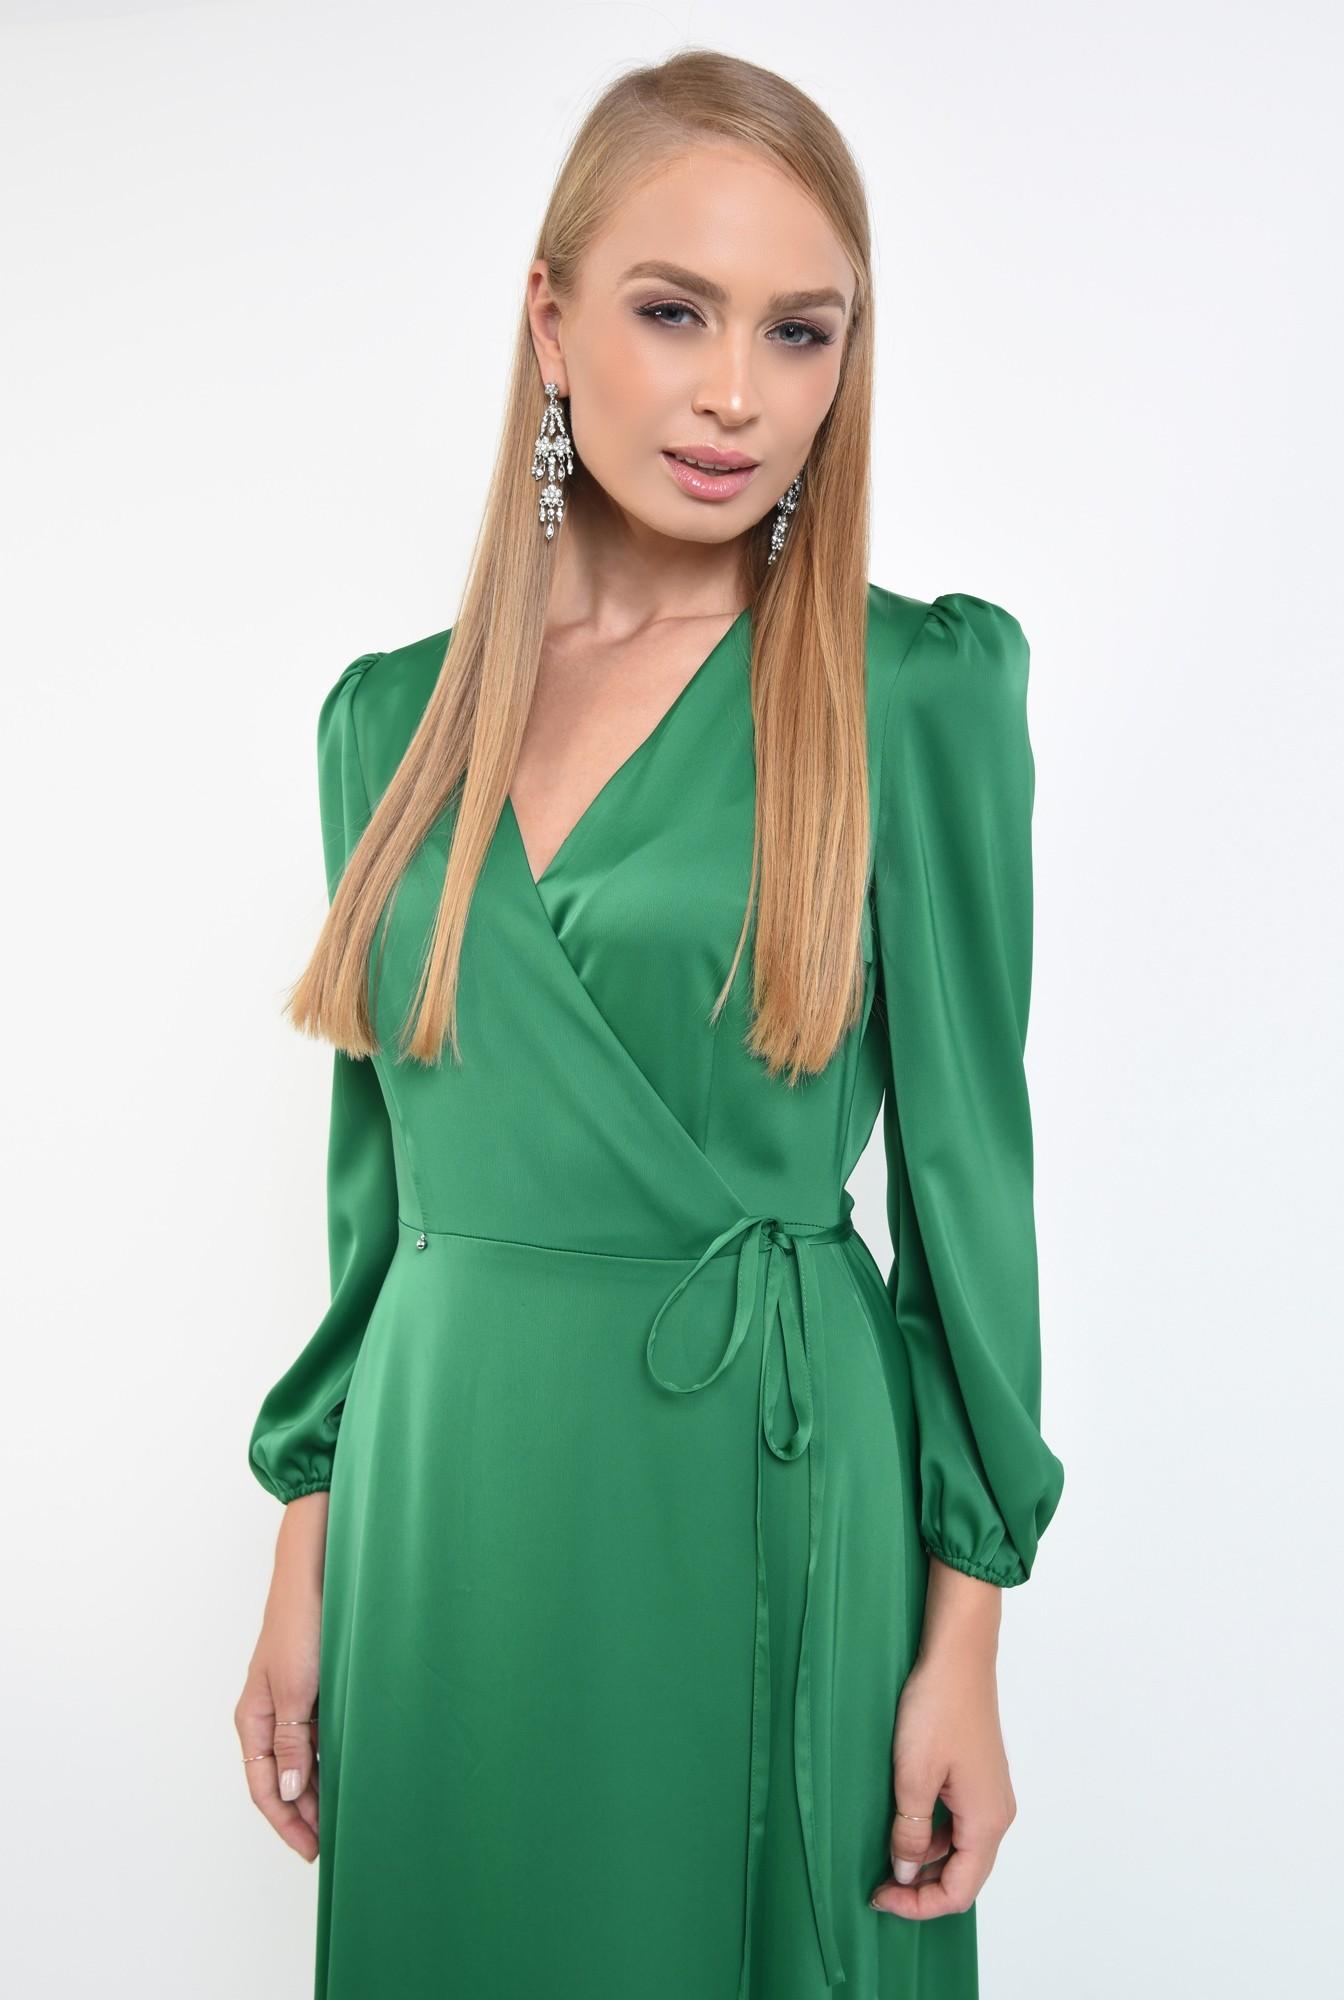 2 - rochie de seara, slit adanc, verde, satin, rochie maxi